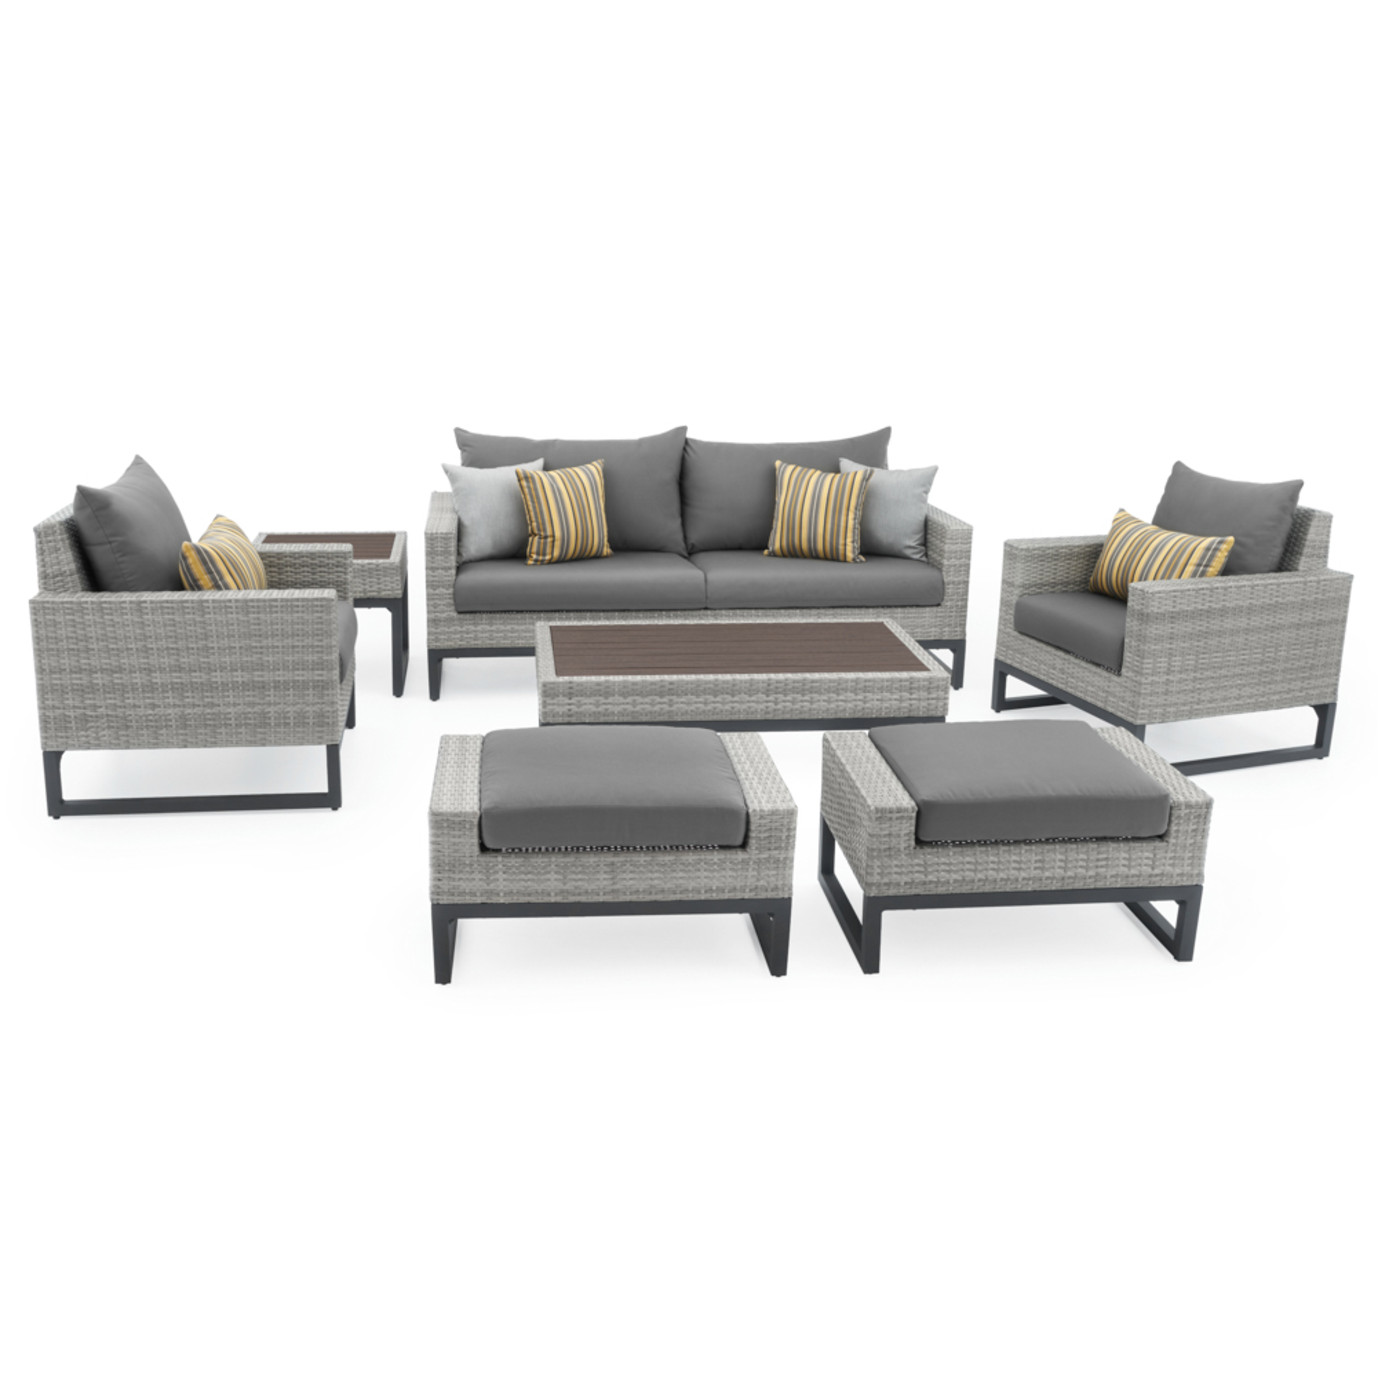 Milo™ Gray 18pc Estate Set - Charcoal Gray